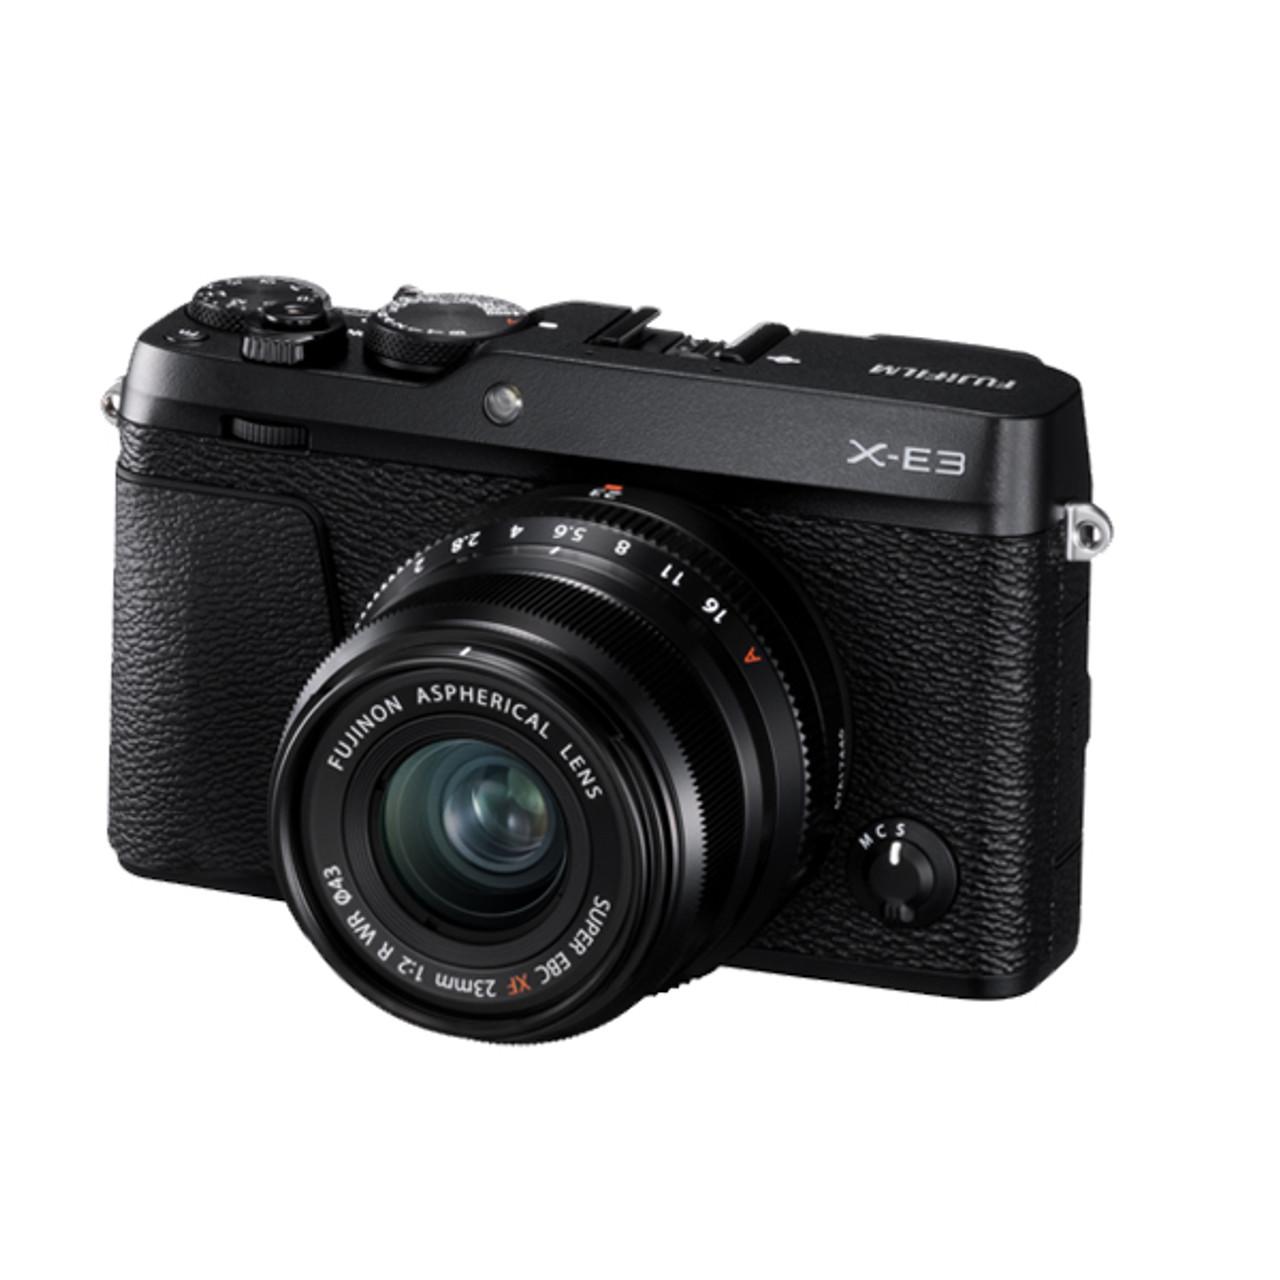 Fujifilm X-E3 23mm F2 Kit Black